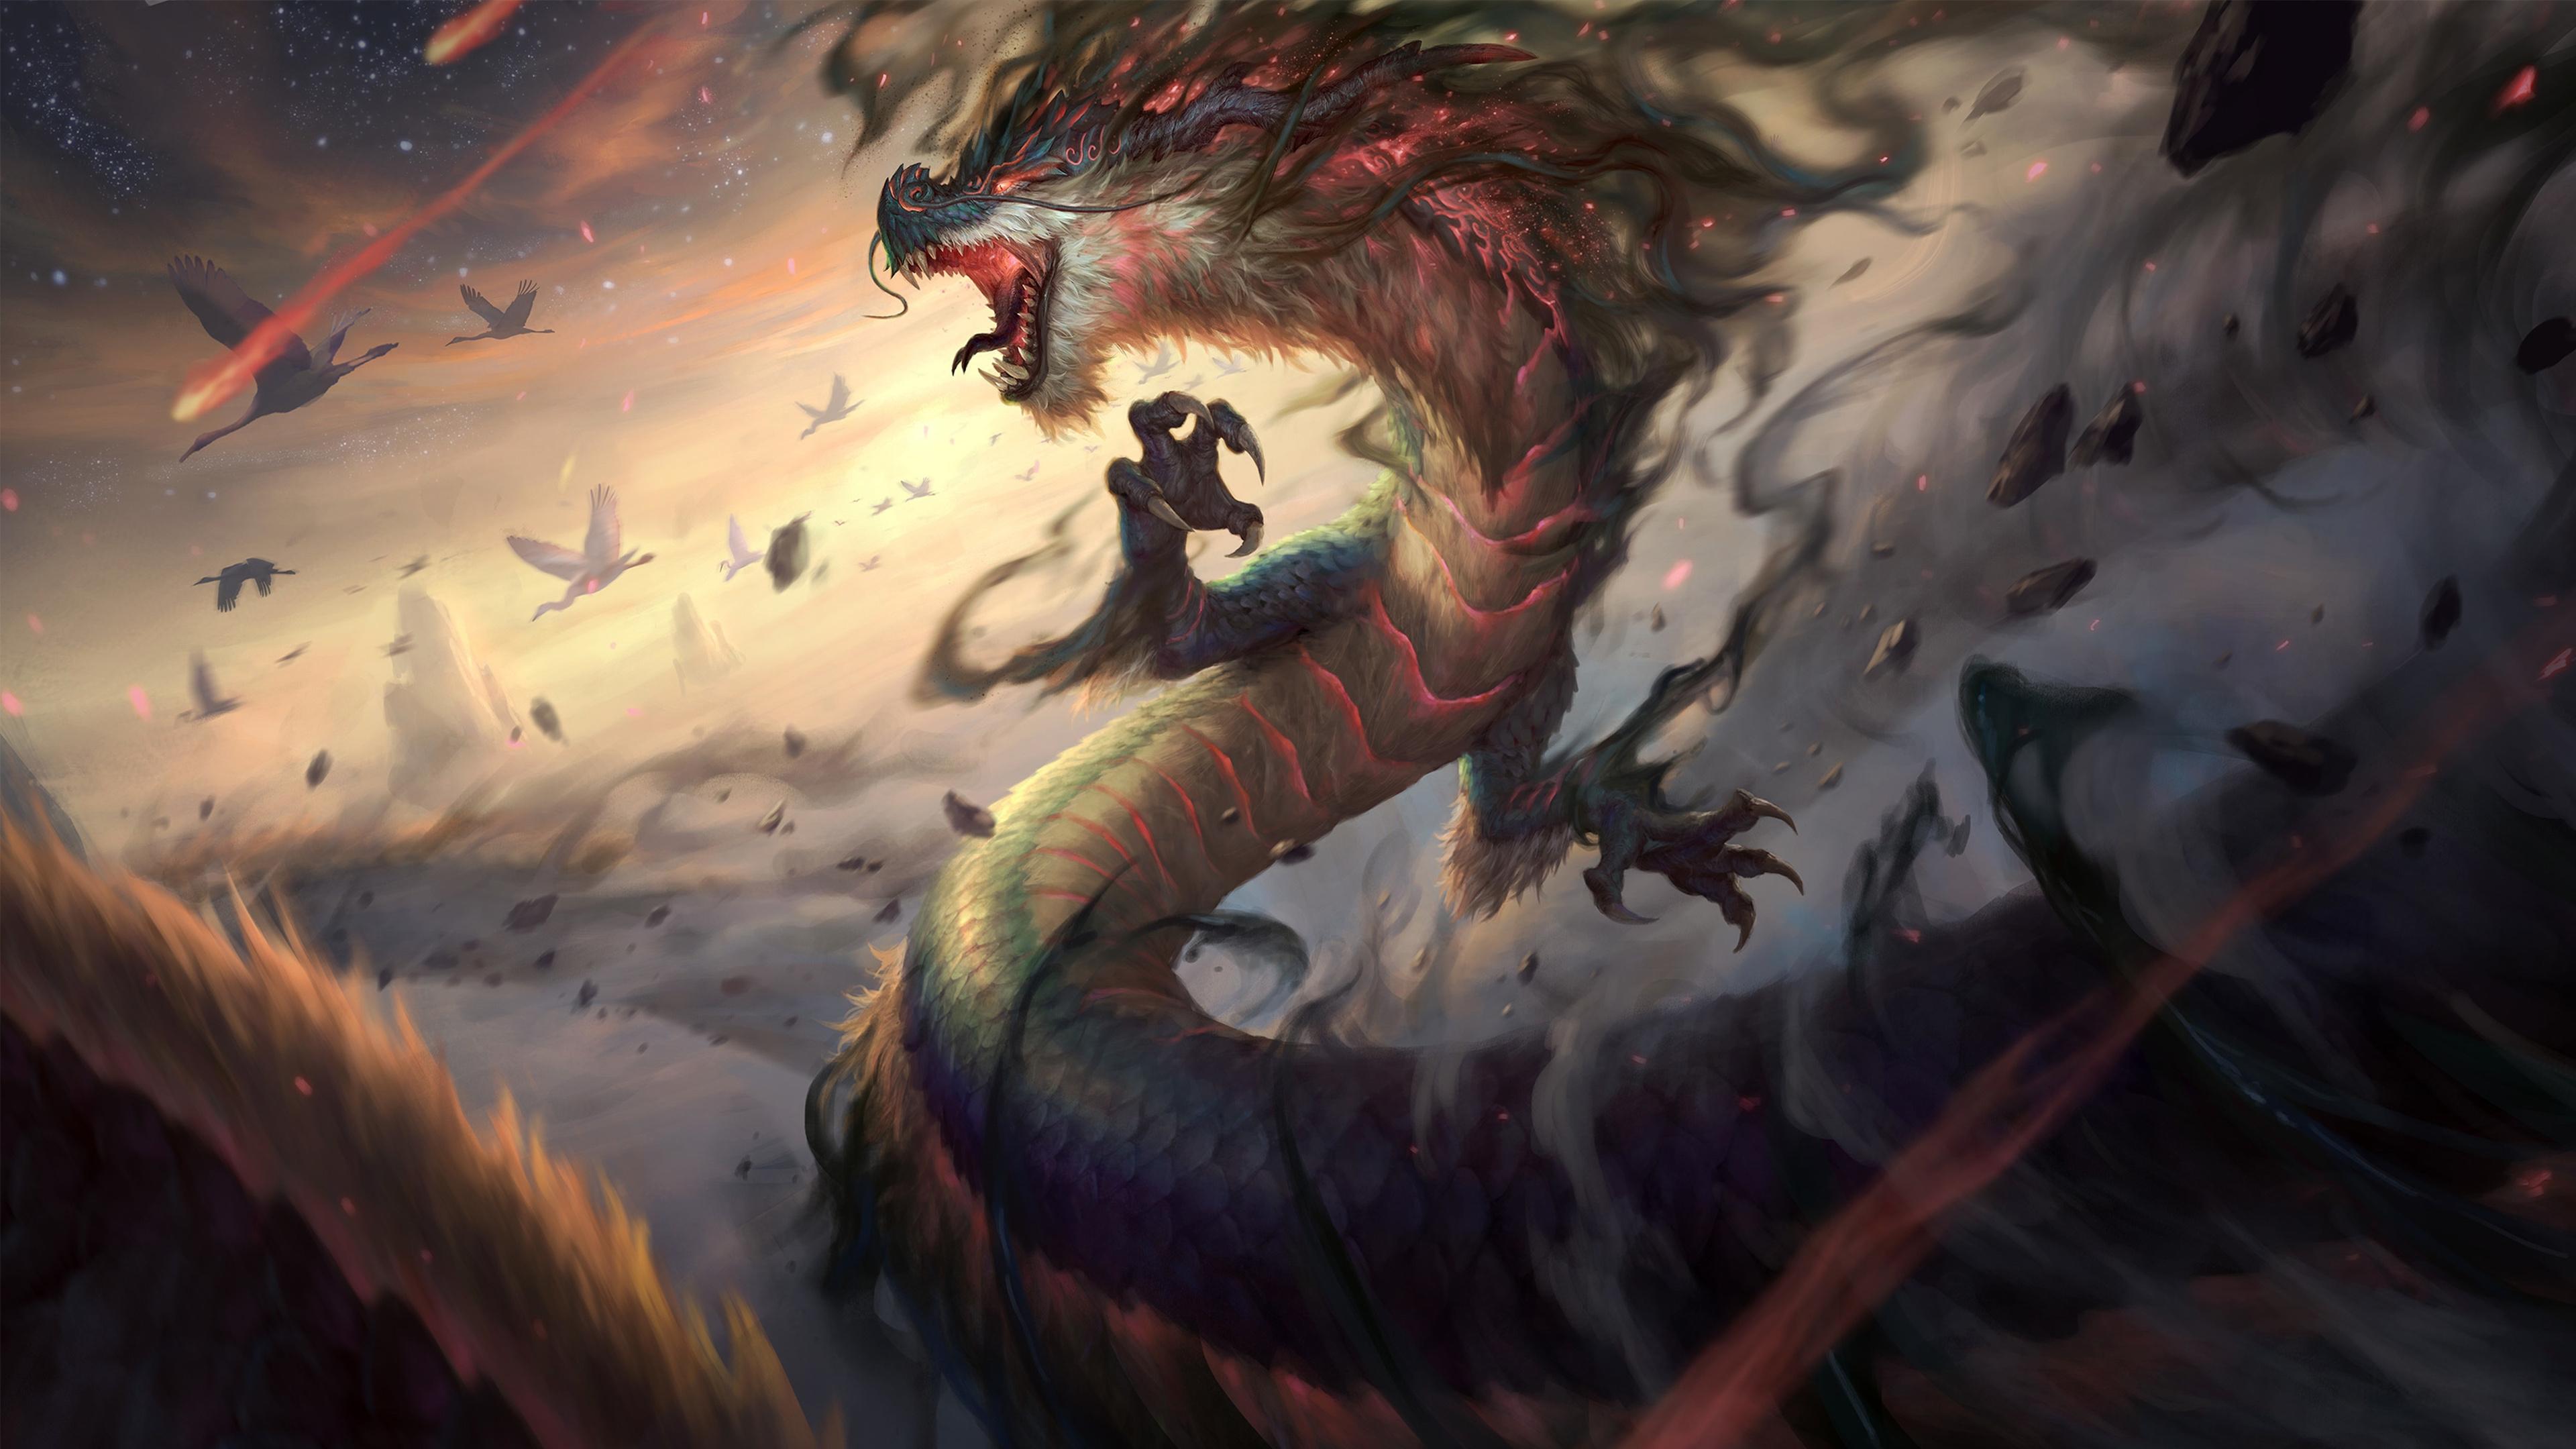 General 3840x2160 dragon creature fantasy art